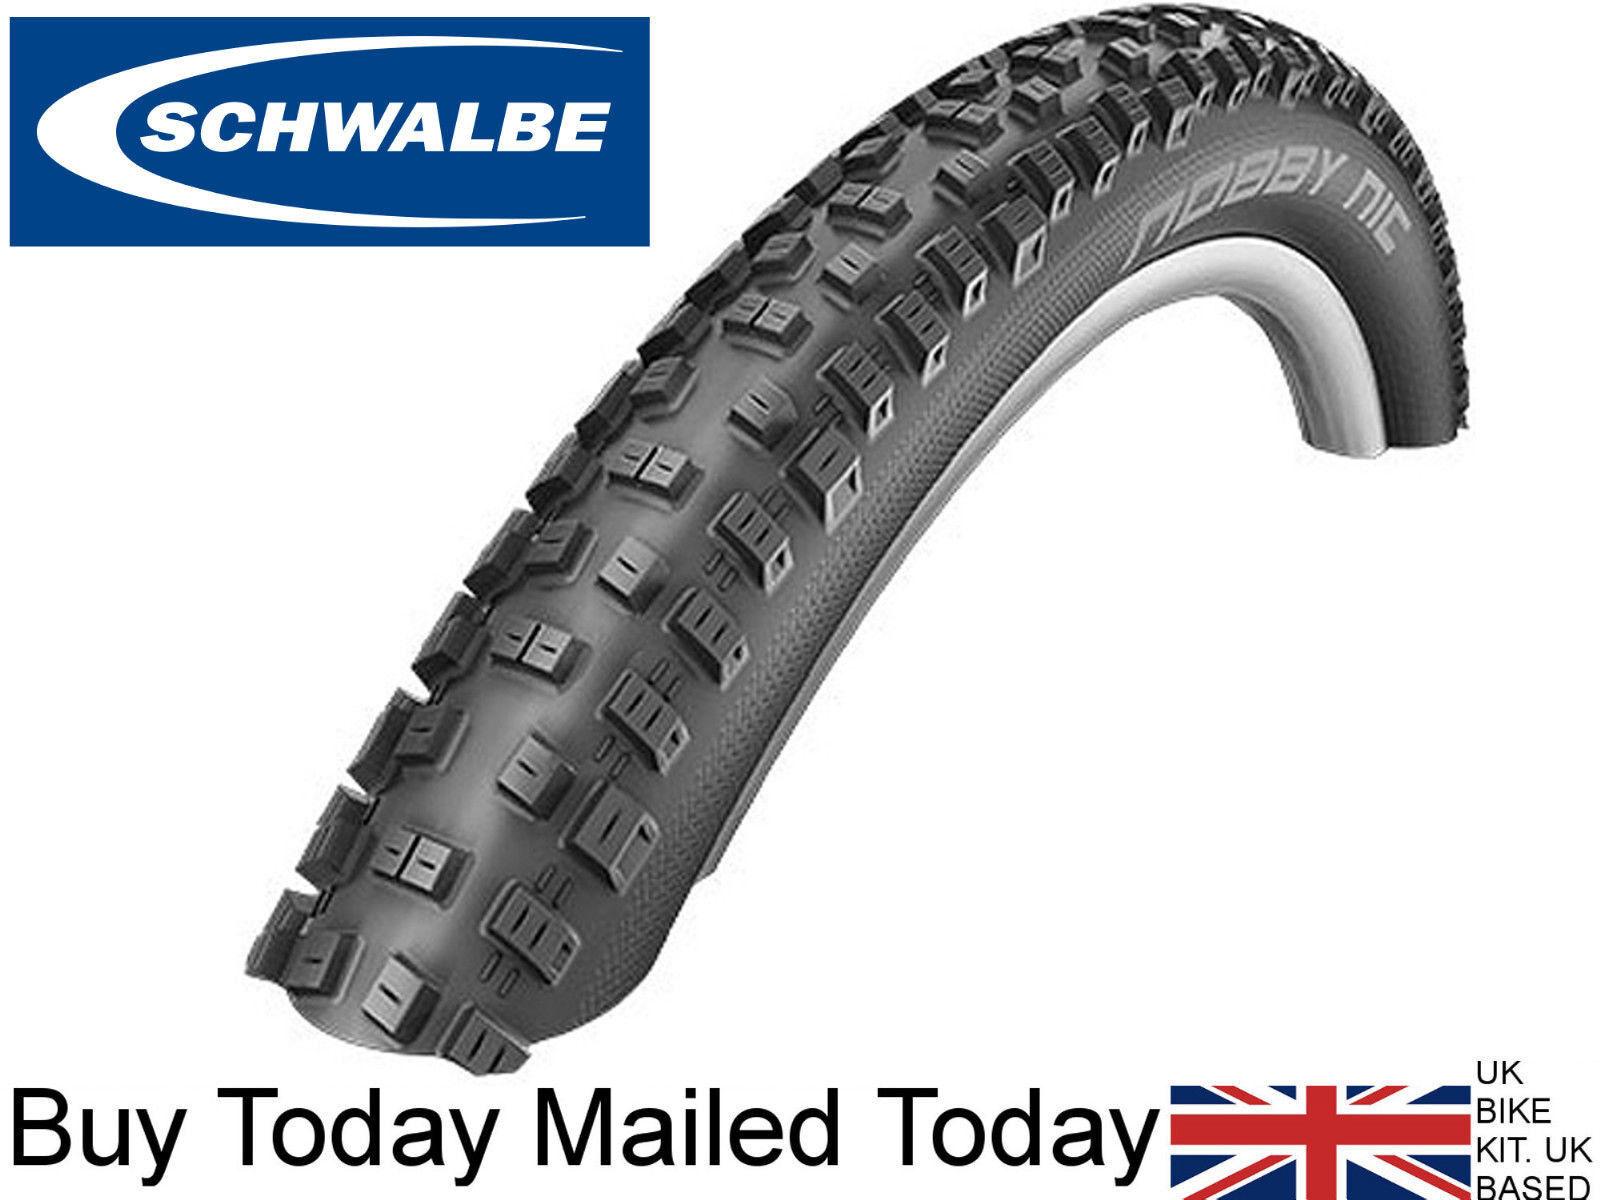 Schwalbe Nobby Nic Performance 26 27.5 29 x 2.1 2.25 2.35 FOLDING MTB Bike Tyre